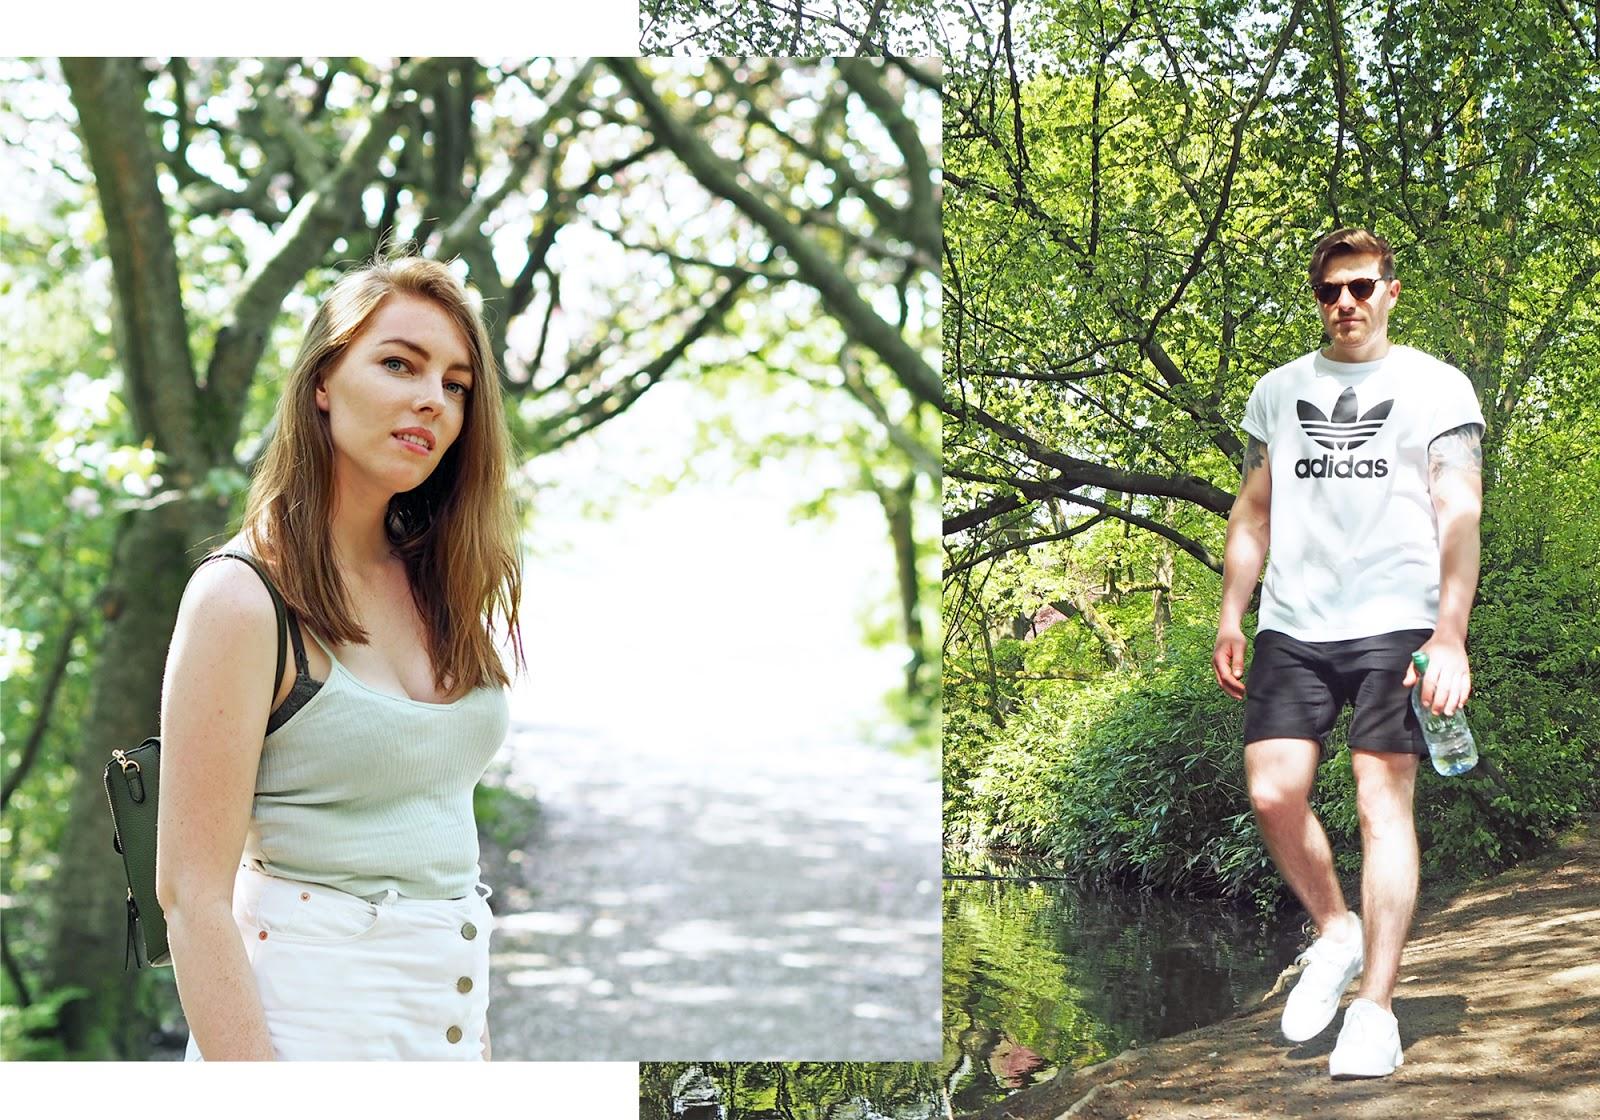 Adidas retro t-shirt